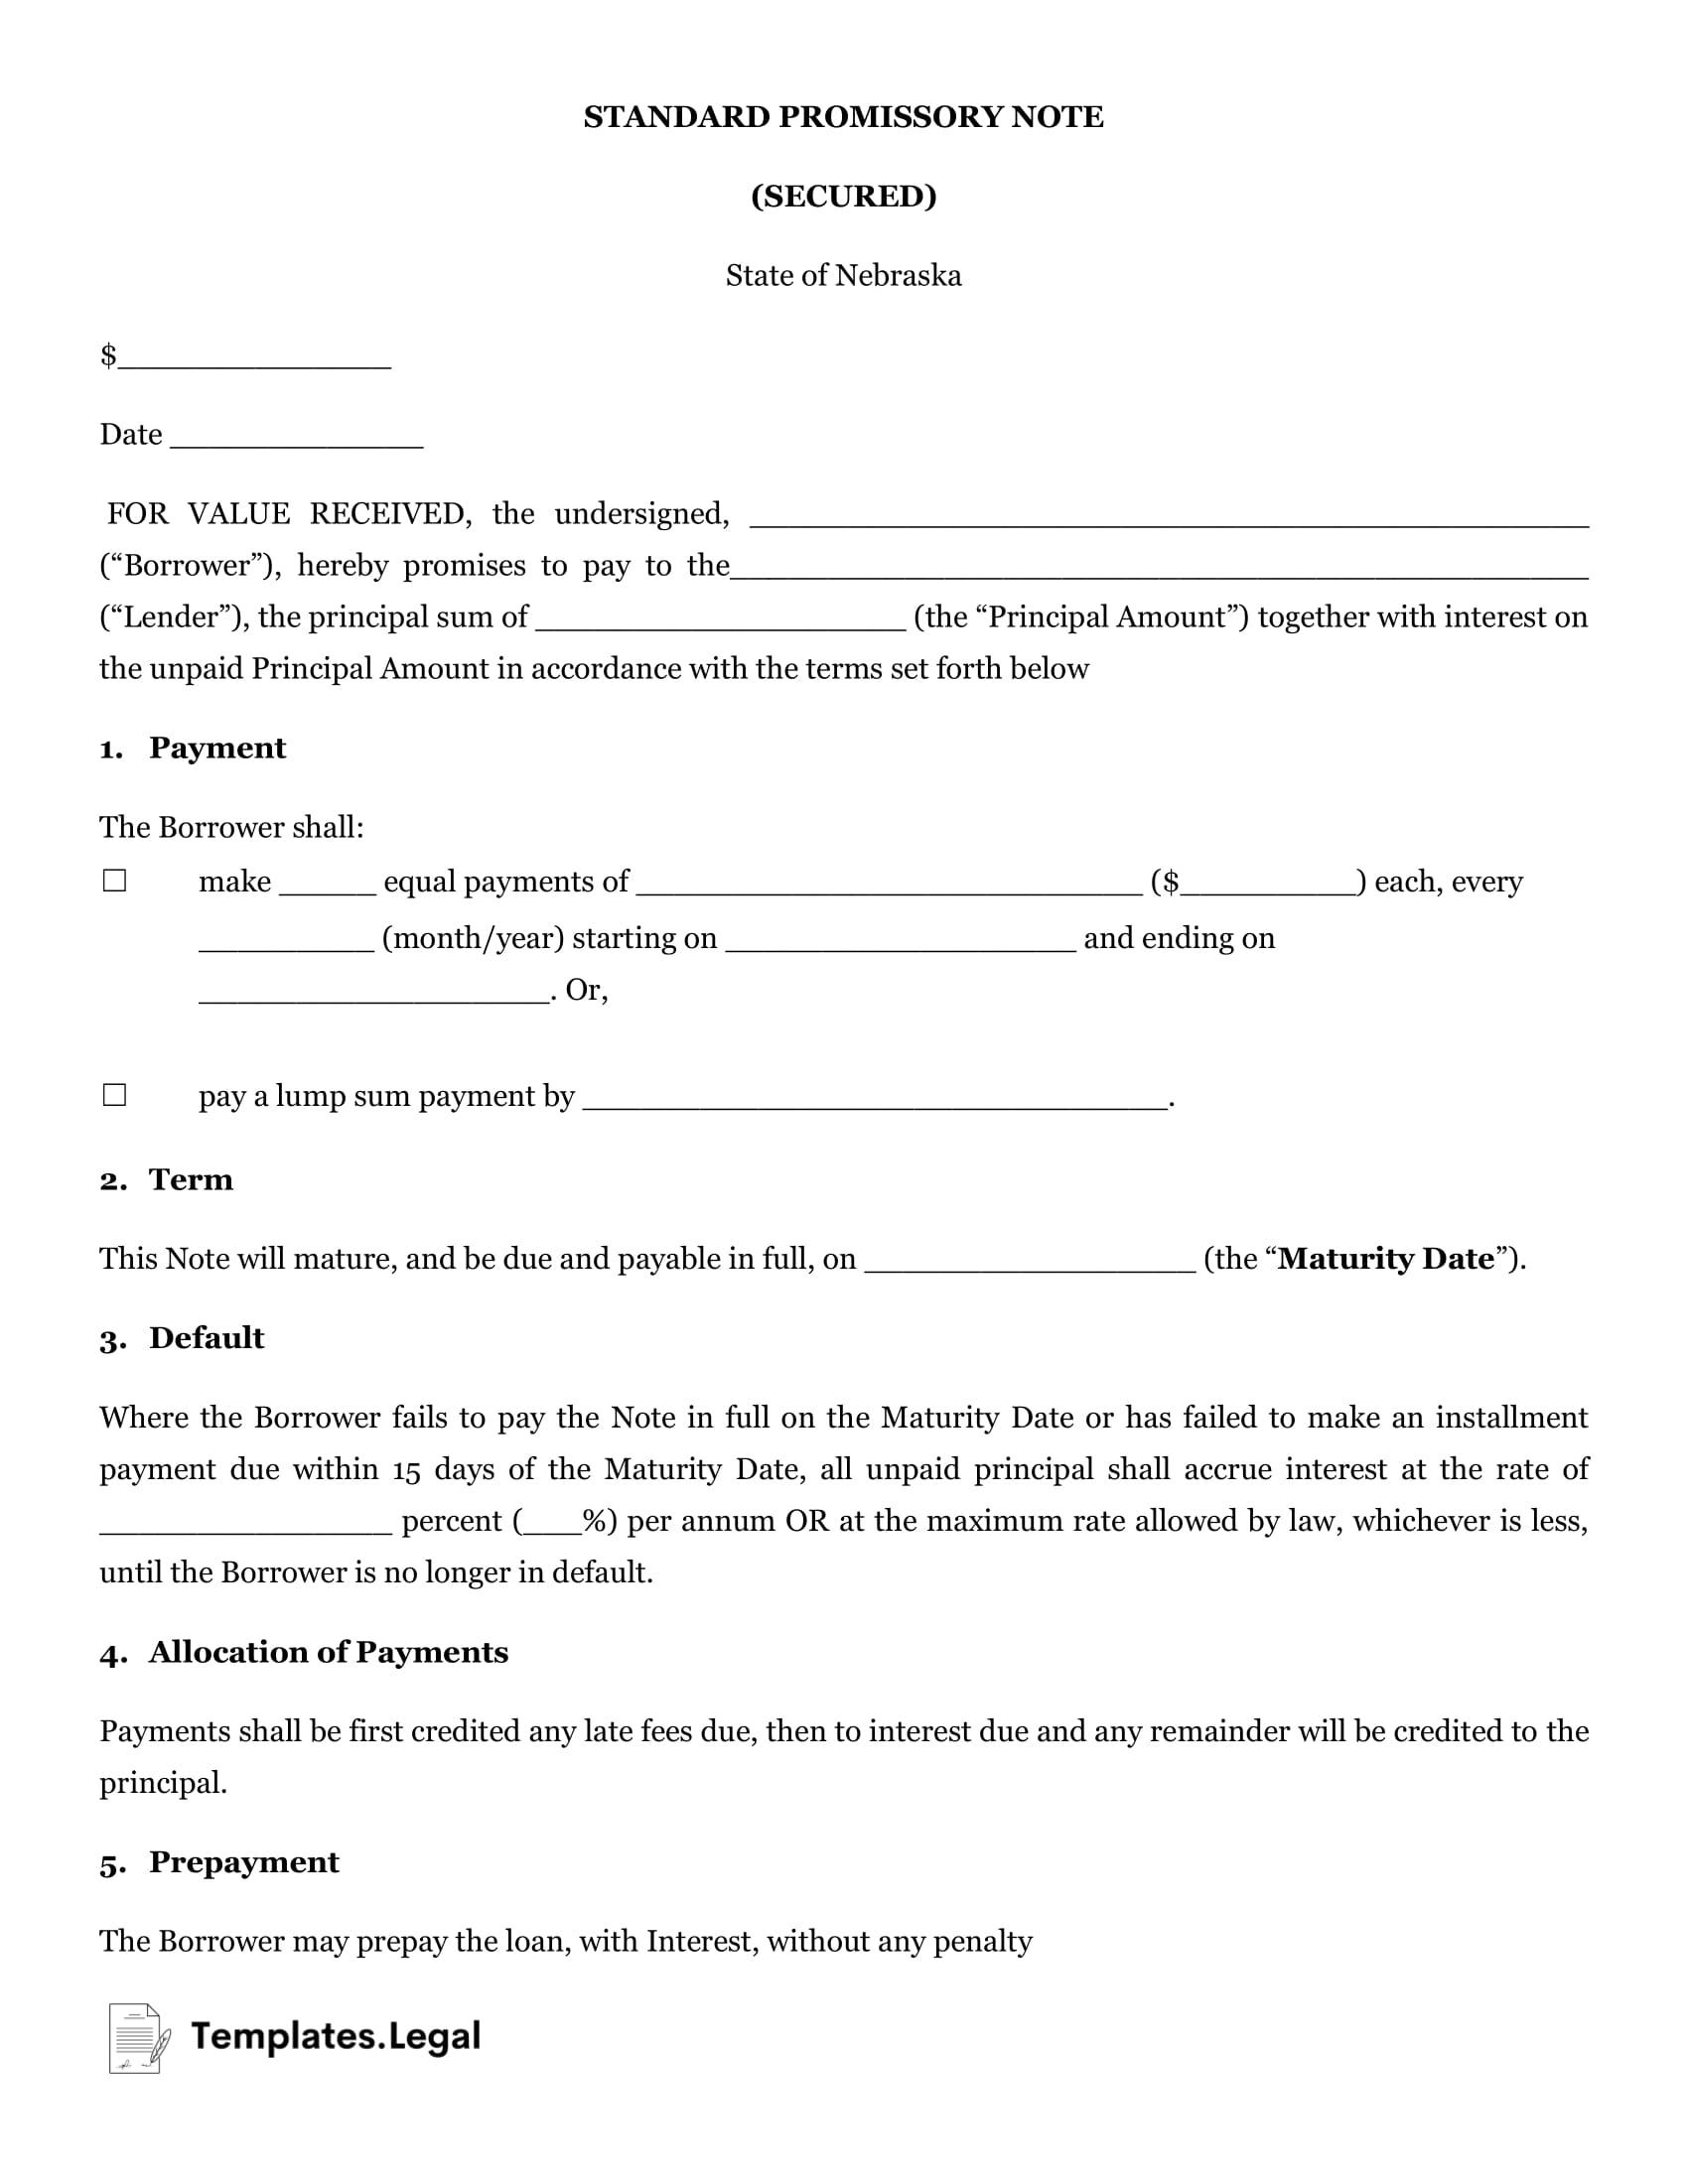 Nebraska Secured Promissory Note - Templates.Legal